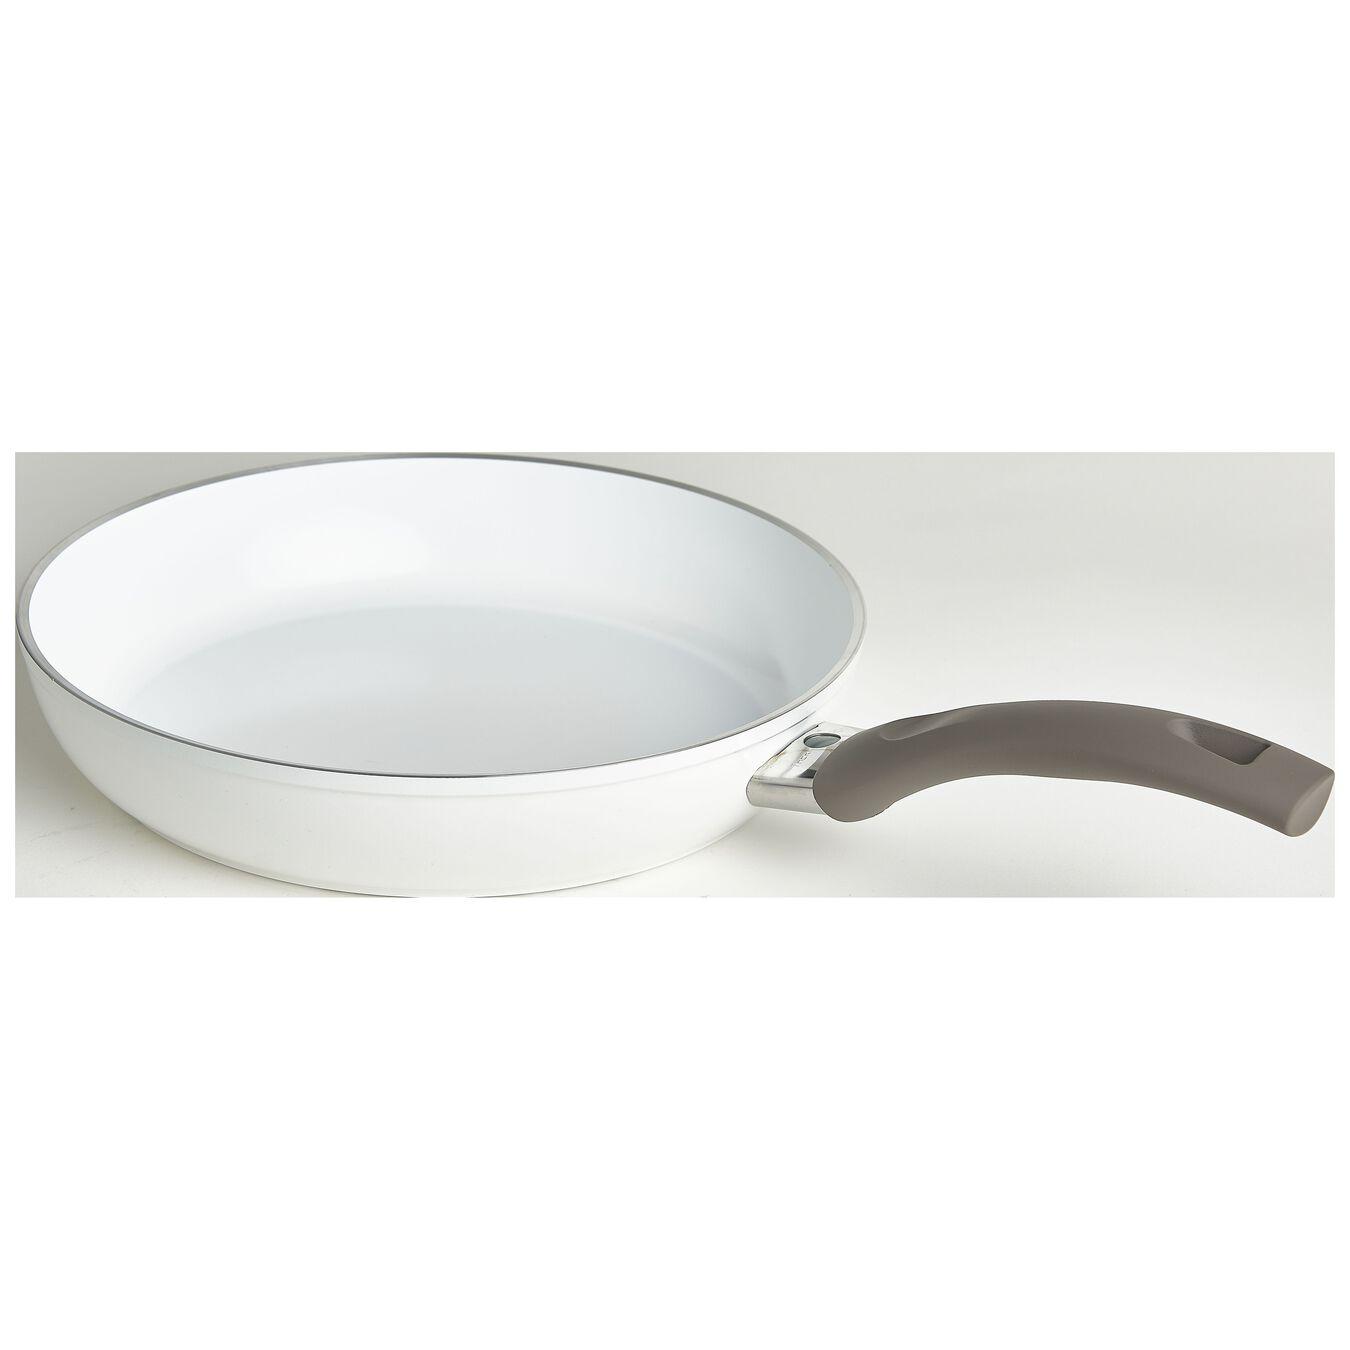 Bratpfanne flach 24 cm, Aluminium, Weiß,,large 2